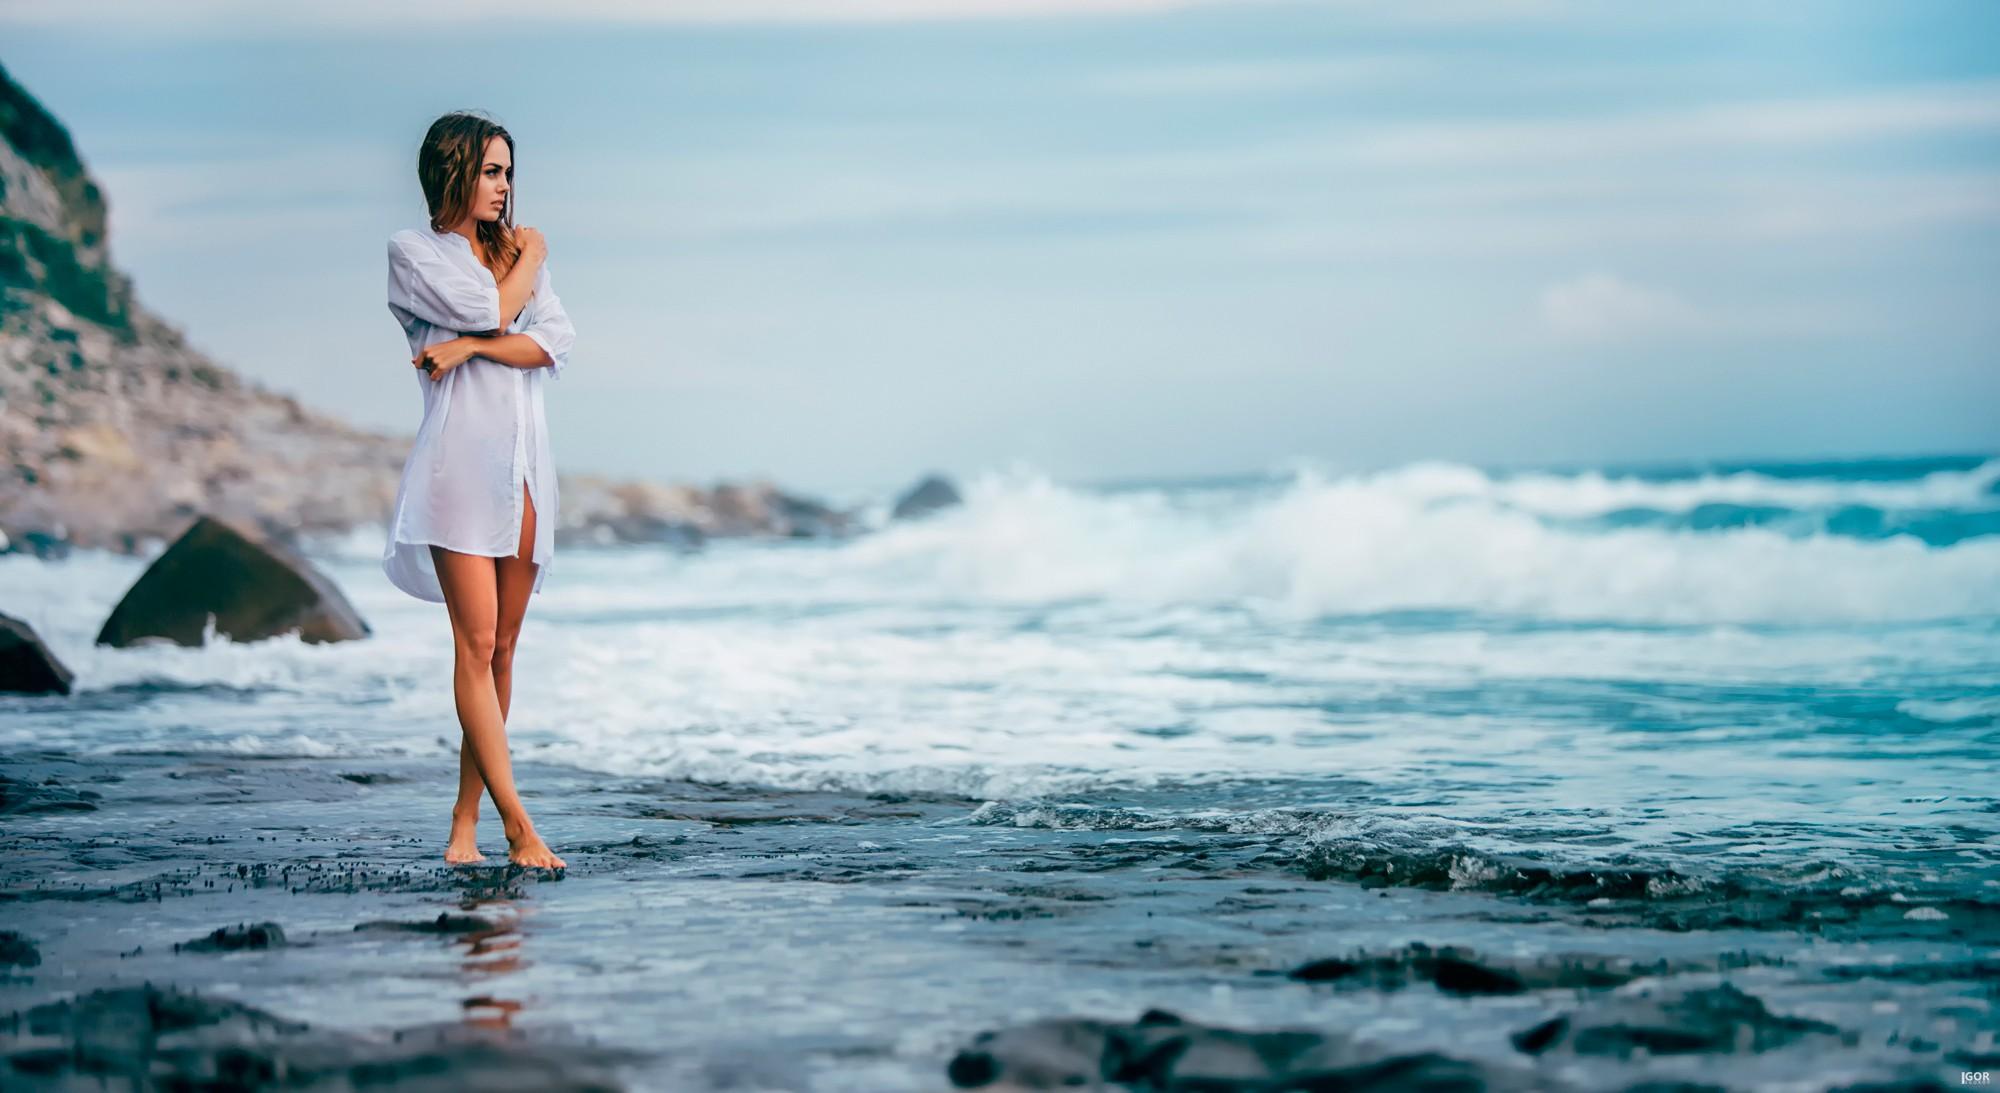 Фото девушек на фоне океана, Фото: Девушка на фоне океана 9 фотография